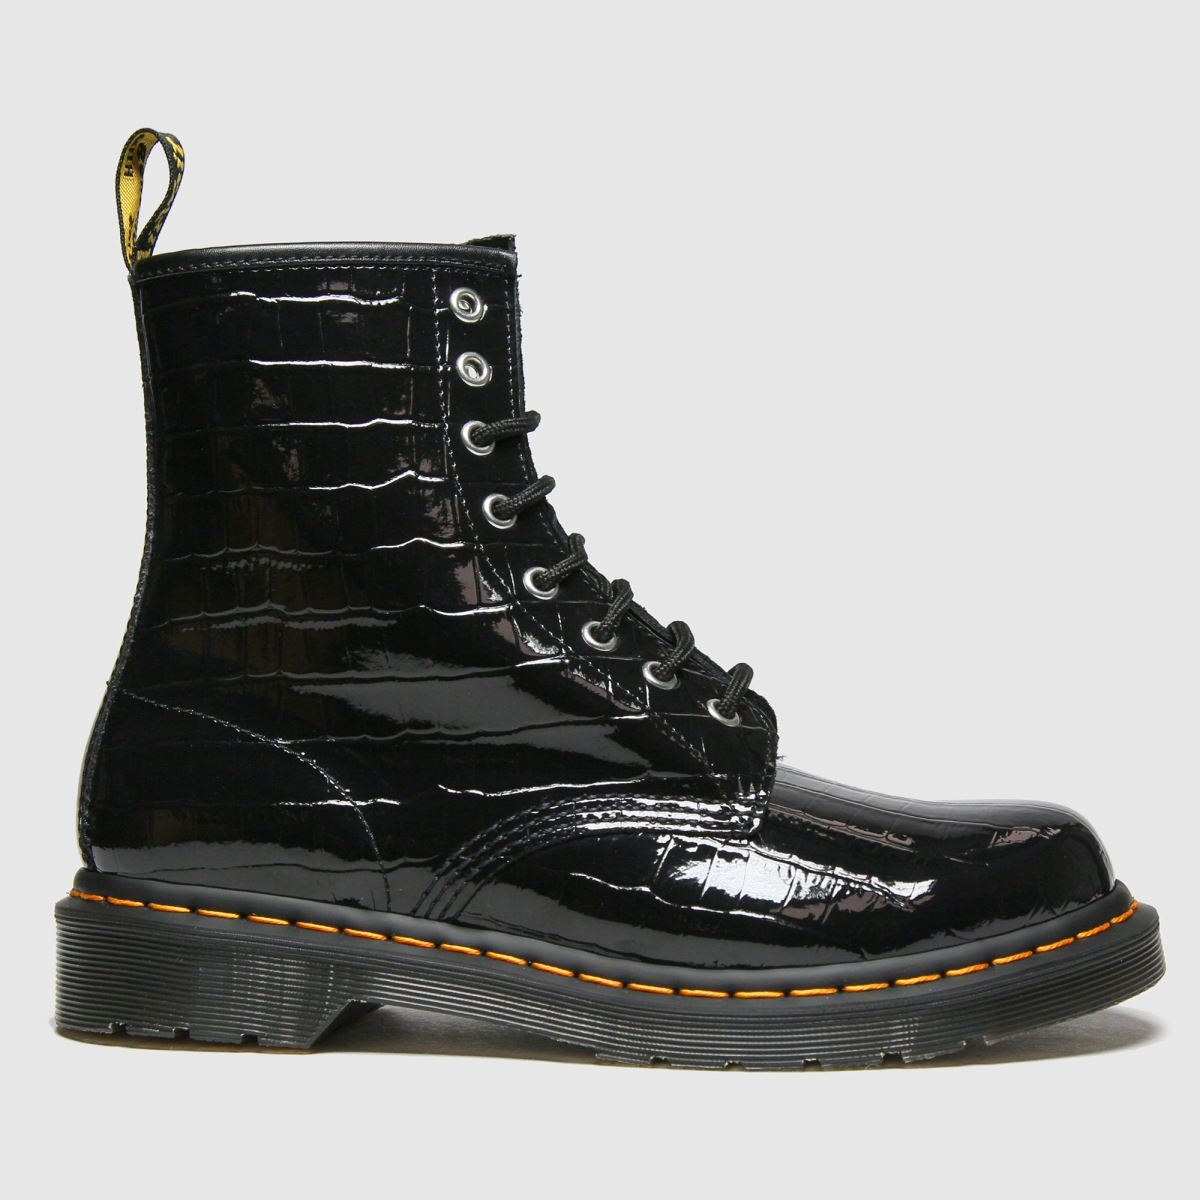 Dr Martens Black 1460 Croc Boots